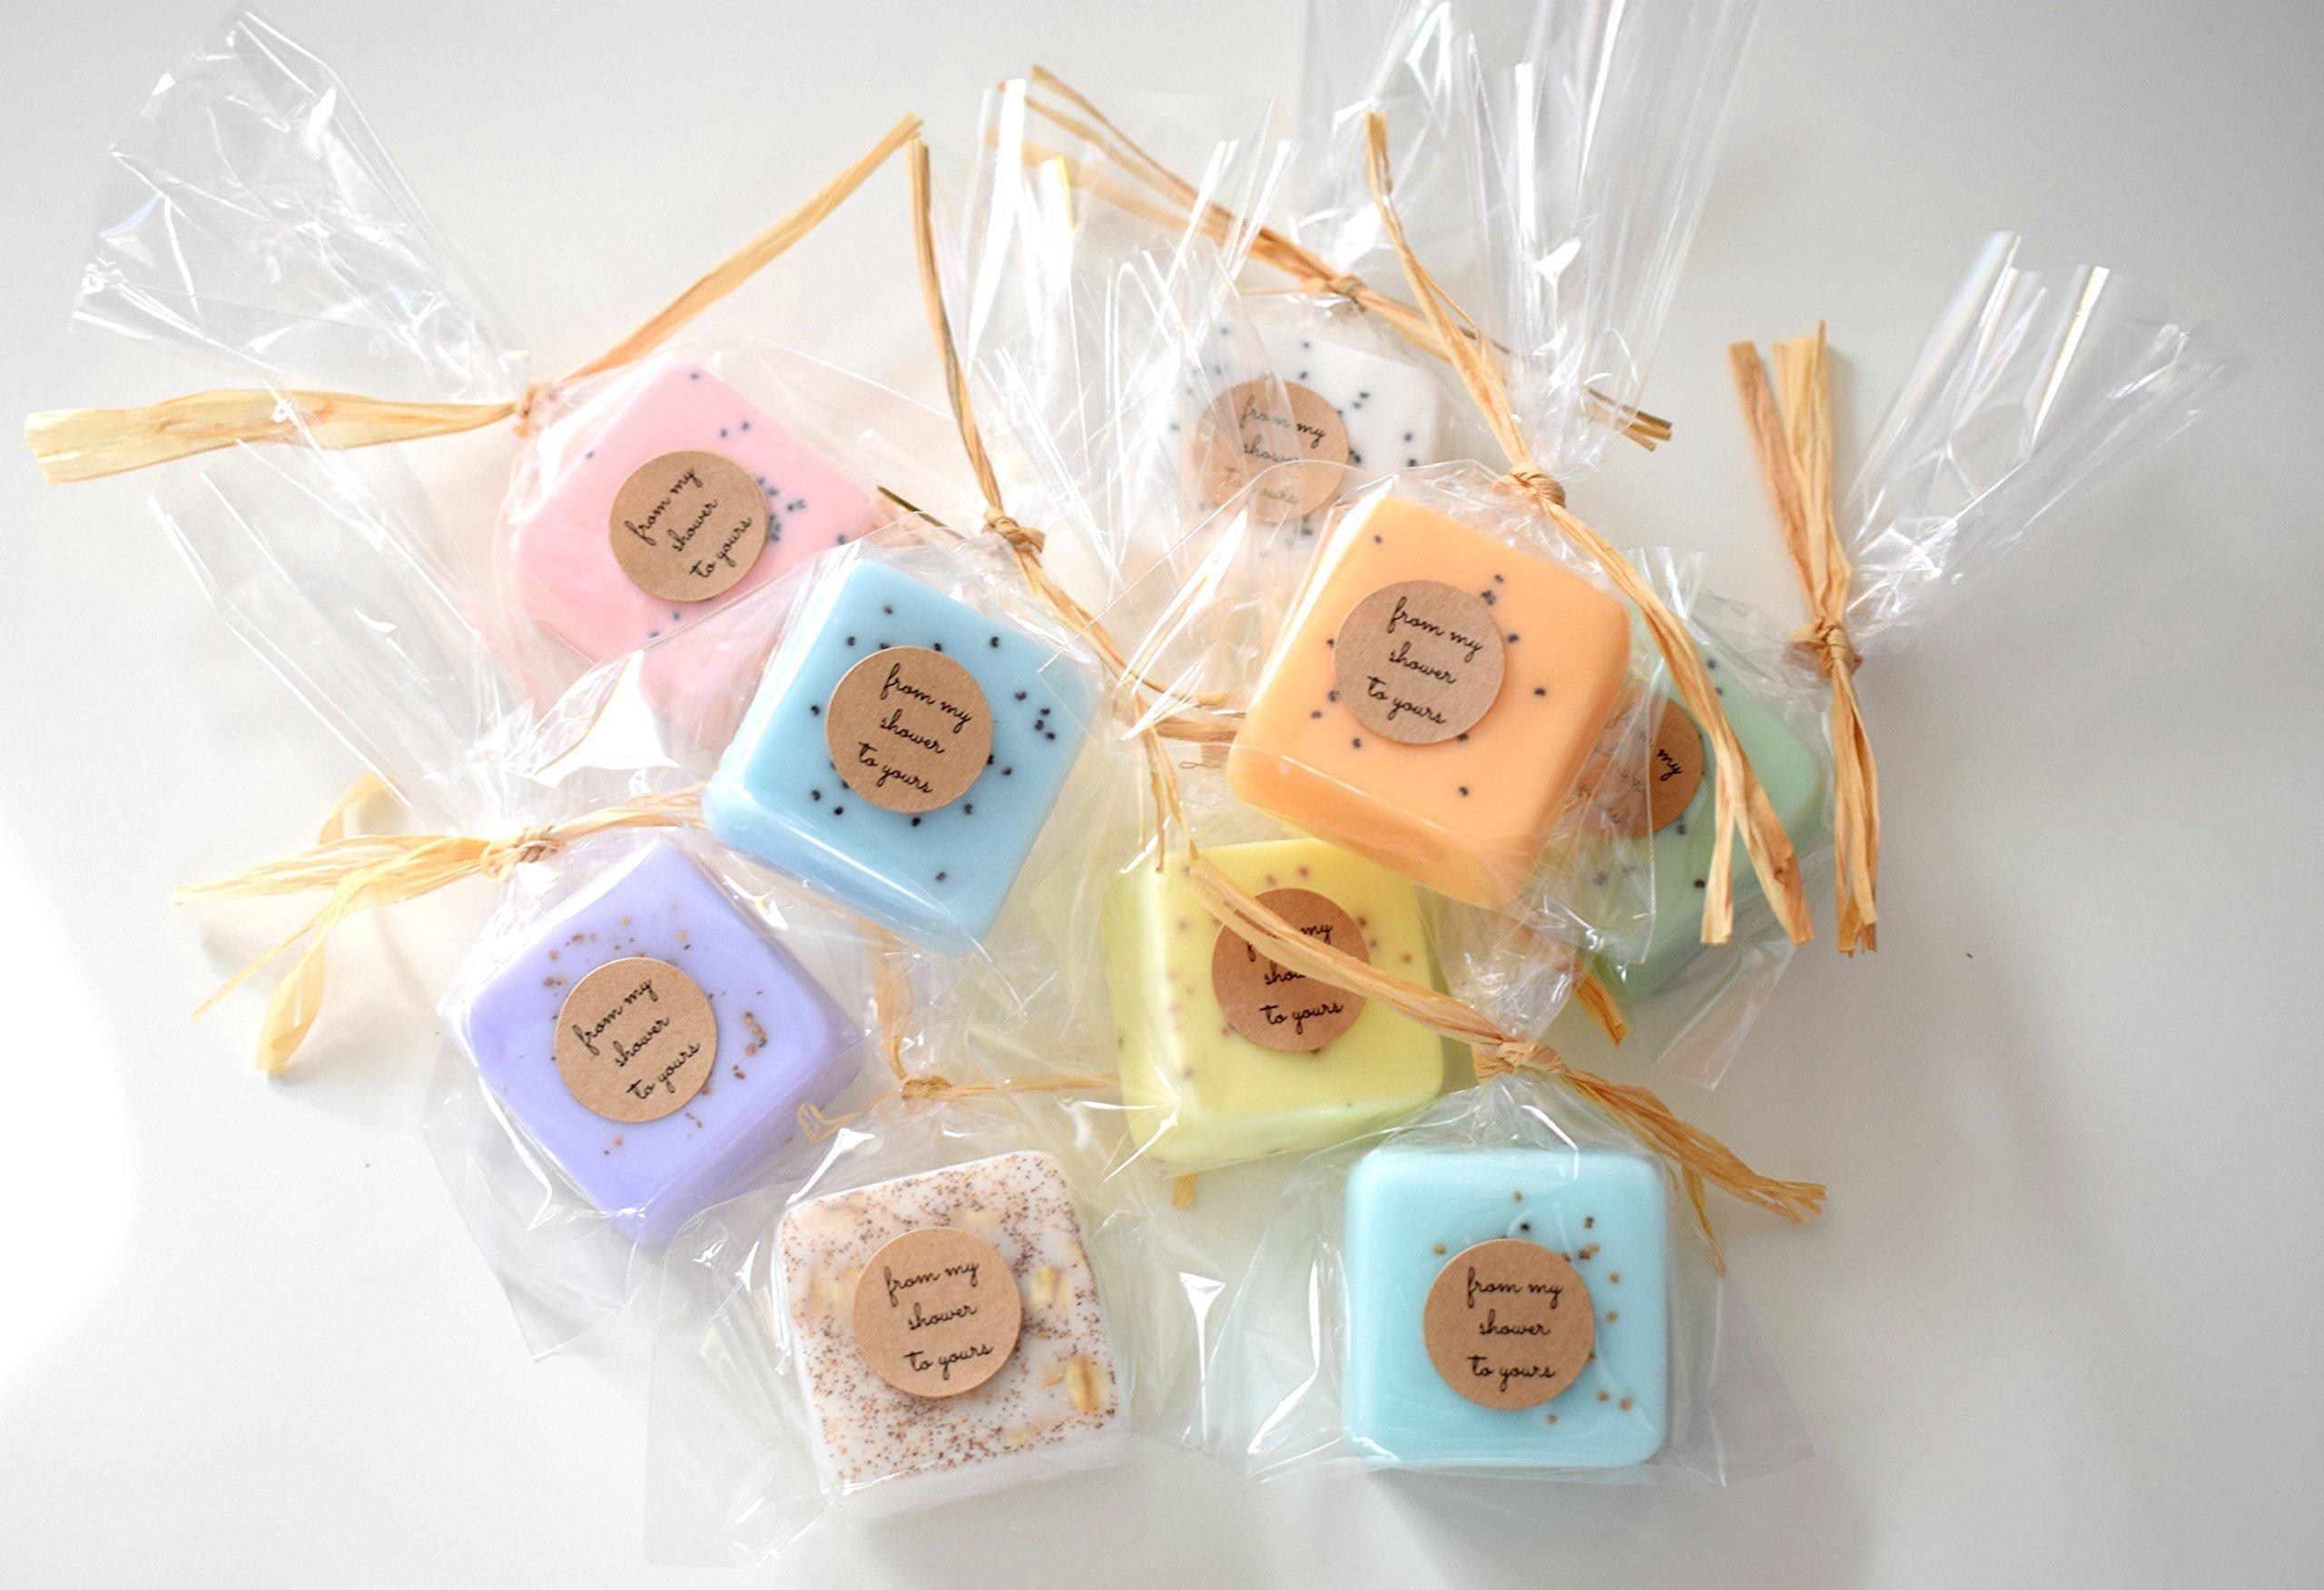 Wedding Favors: 75 Mini Soap Favors for Wedding Favors, Bridal Shower Favors, or Baby Shower Favors